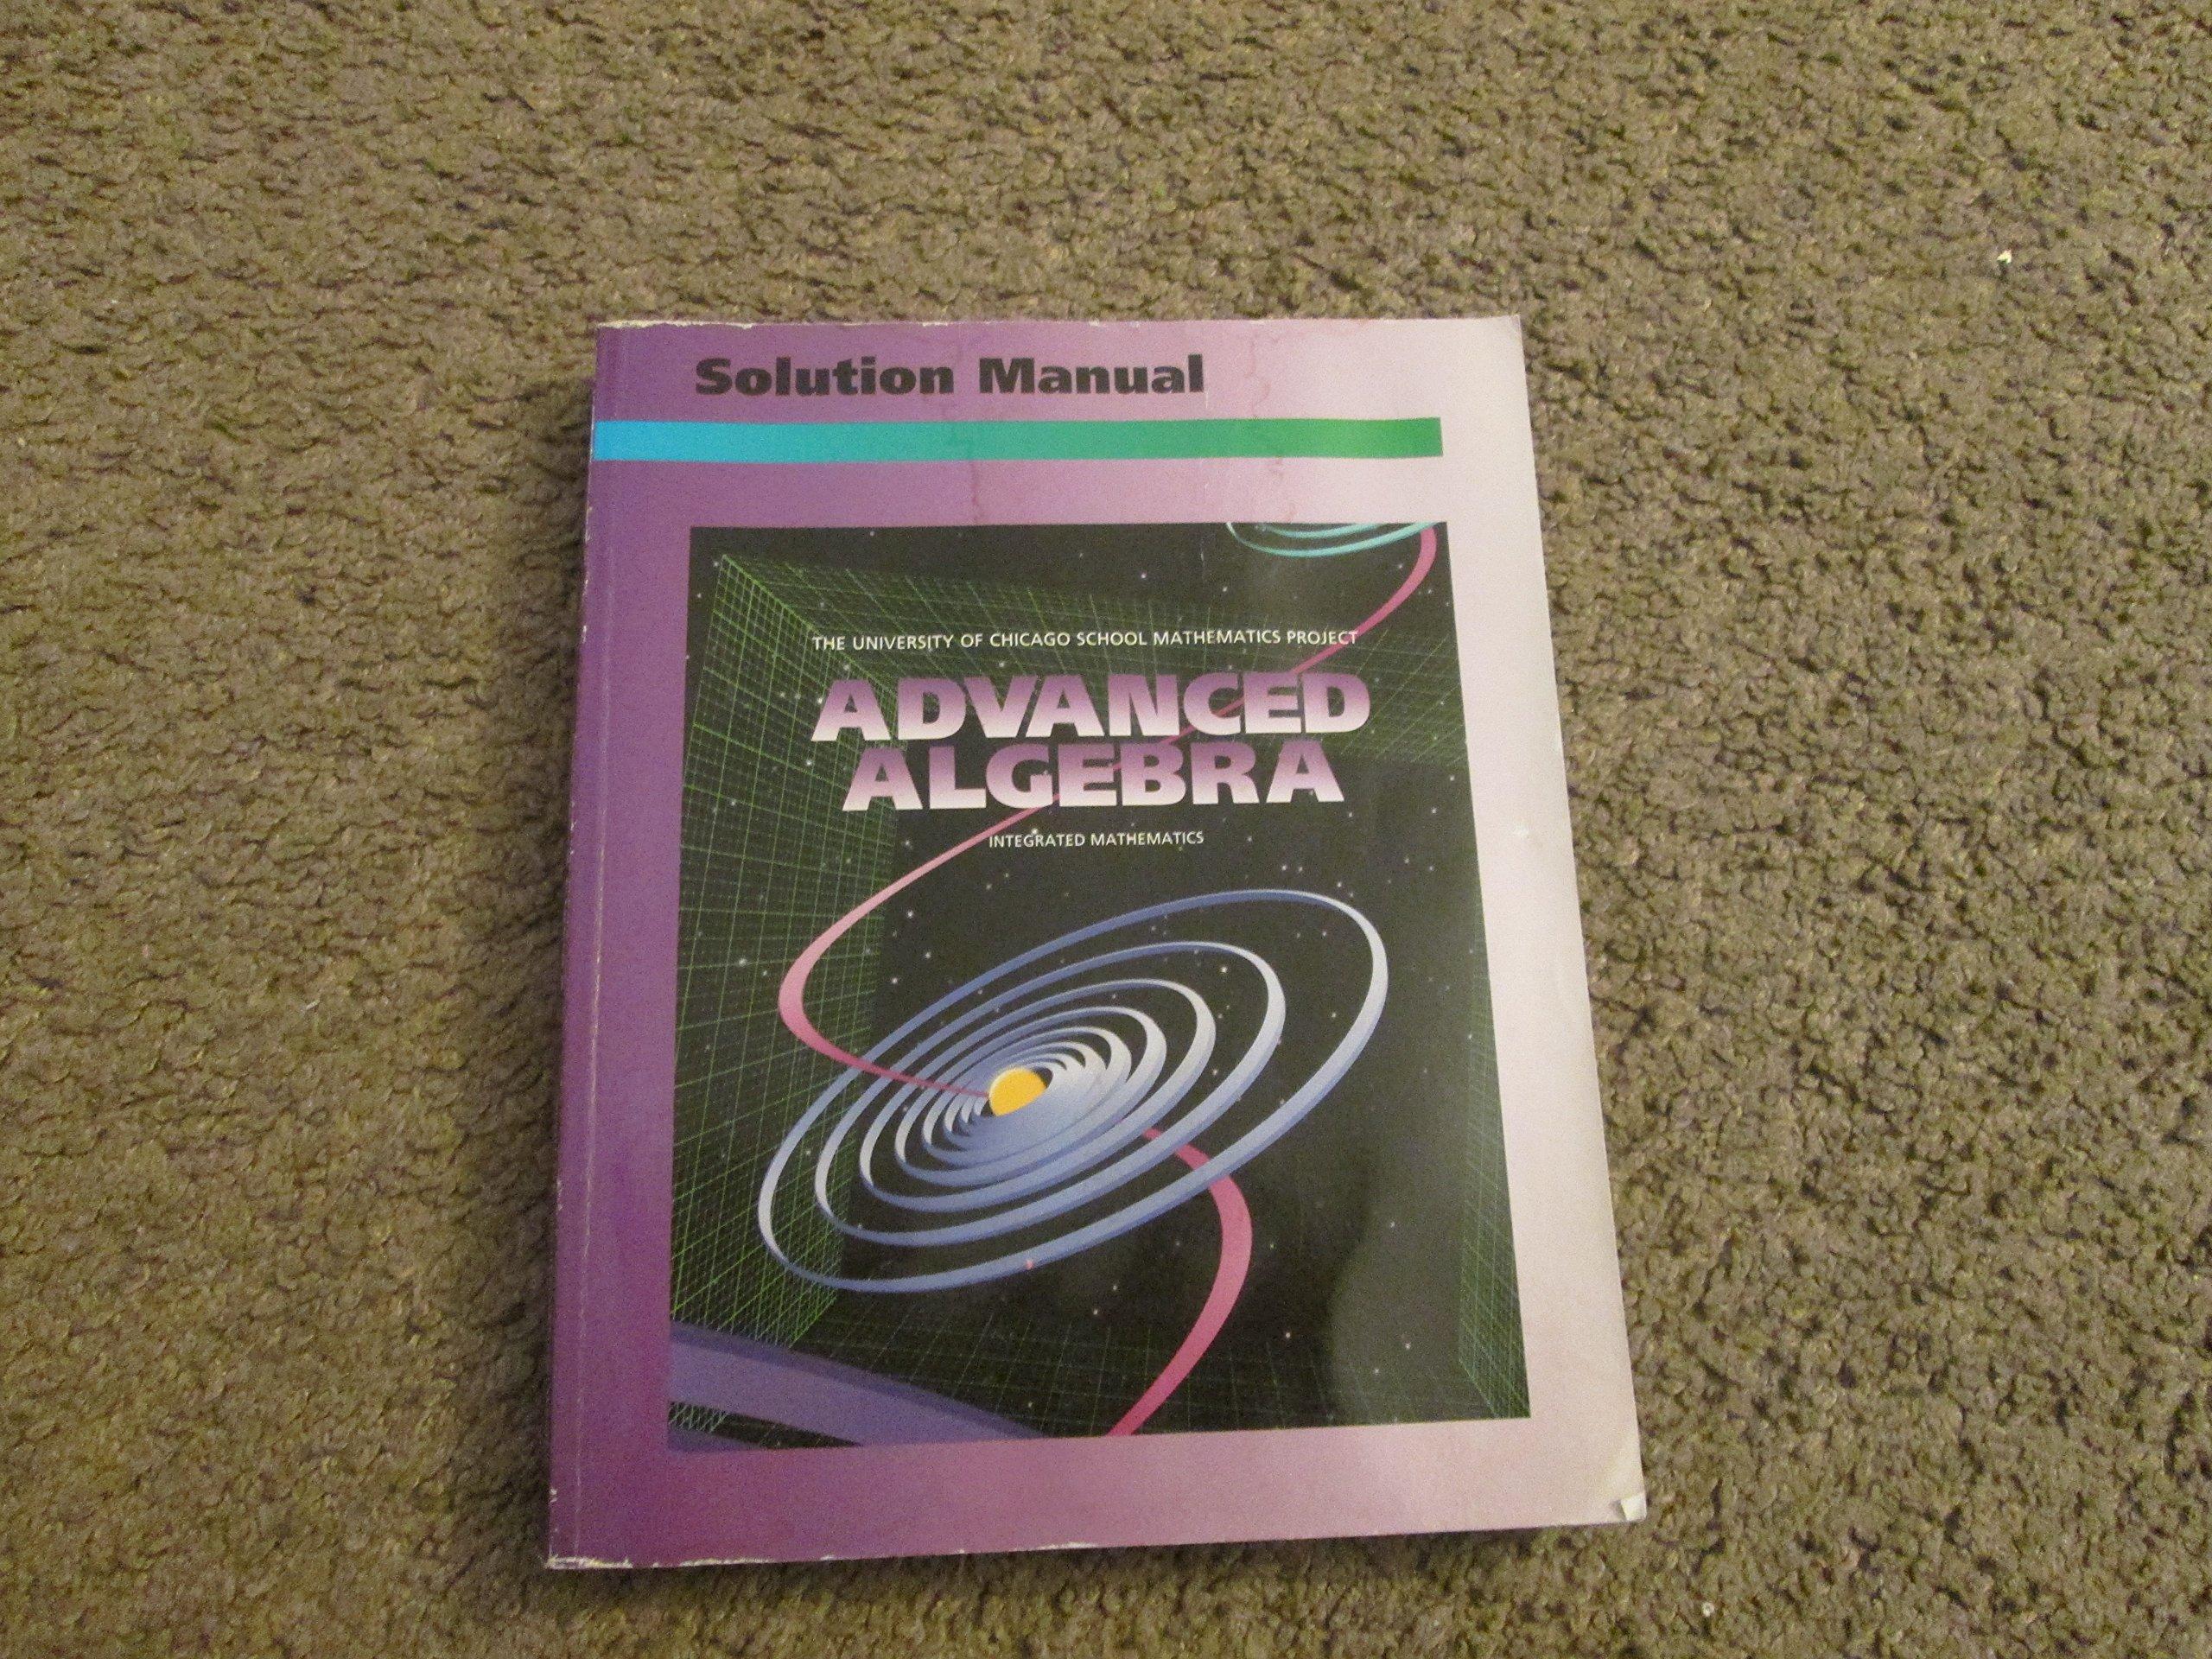 Advanced Algebra: Solution Manual (University of Chicago School Mathematics  Project): 9780673458148: Amazon.com: Books